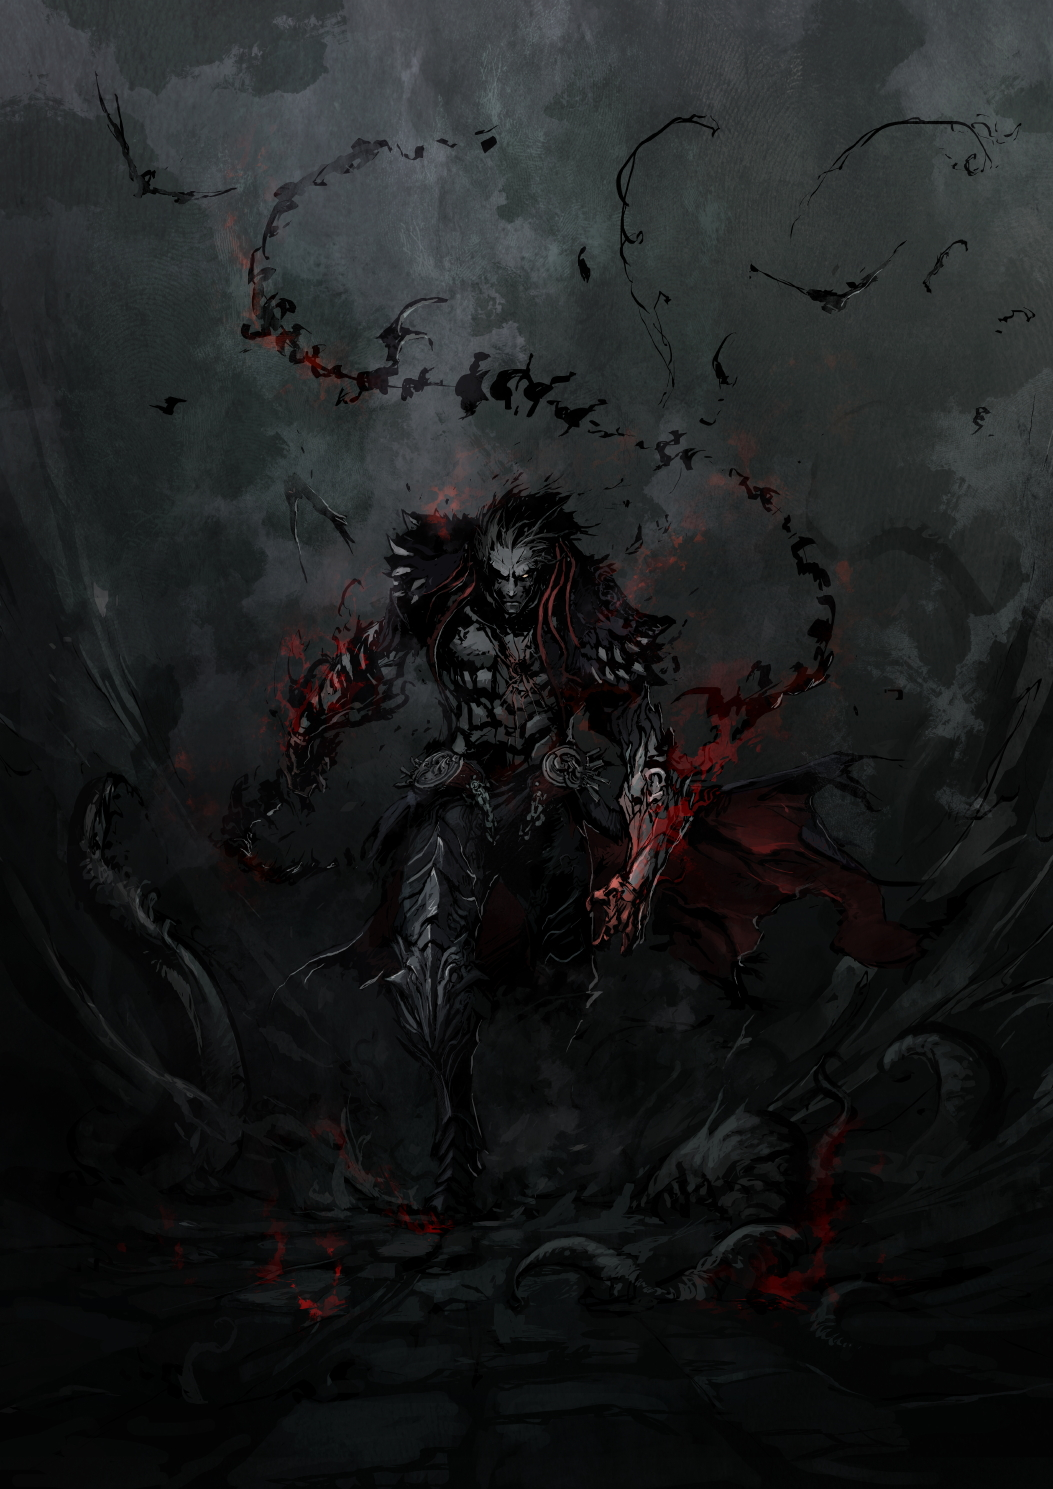 Sběratelská edice Castlevania: Lords of Shadow 2 89432